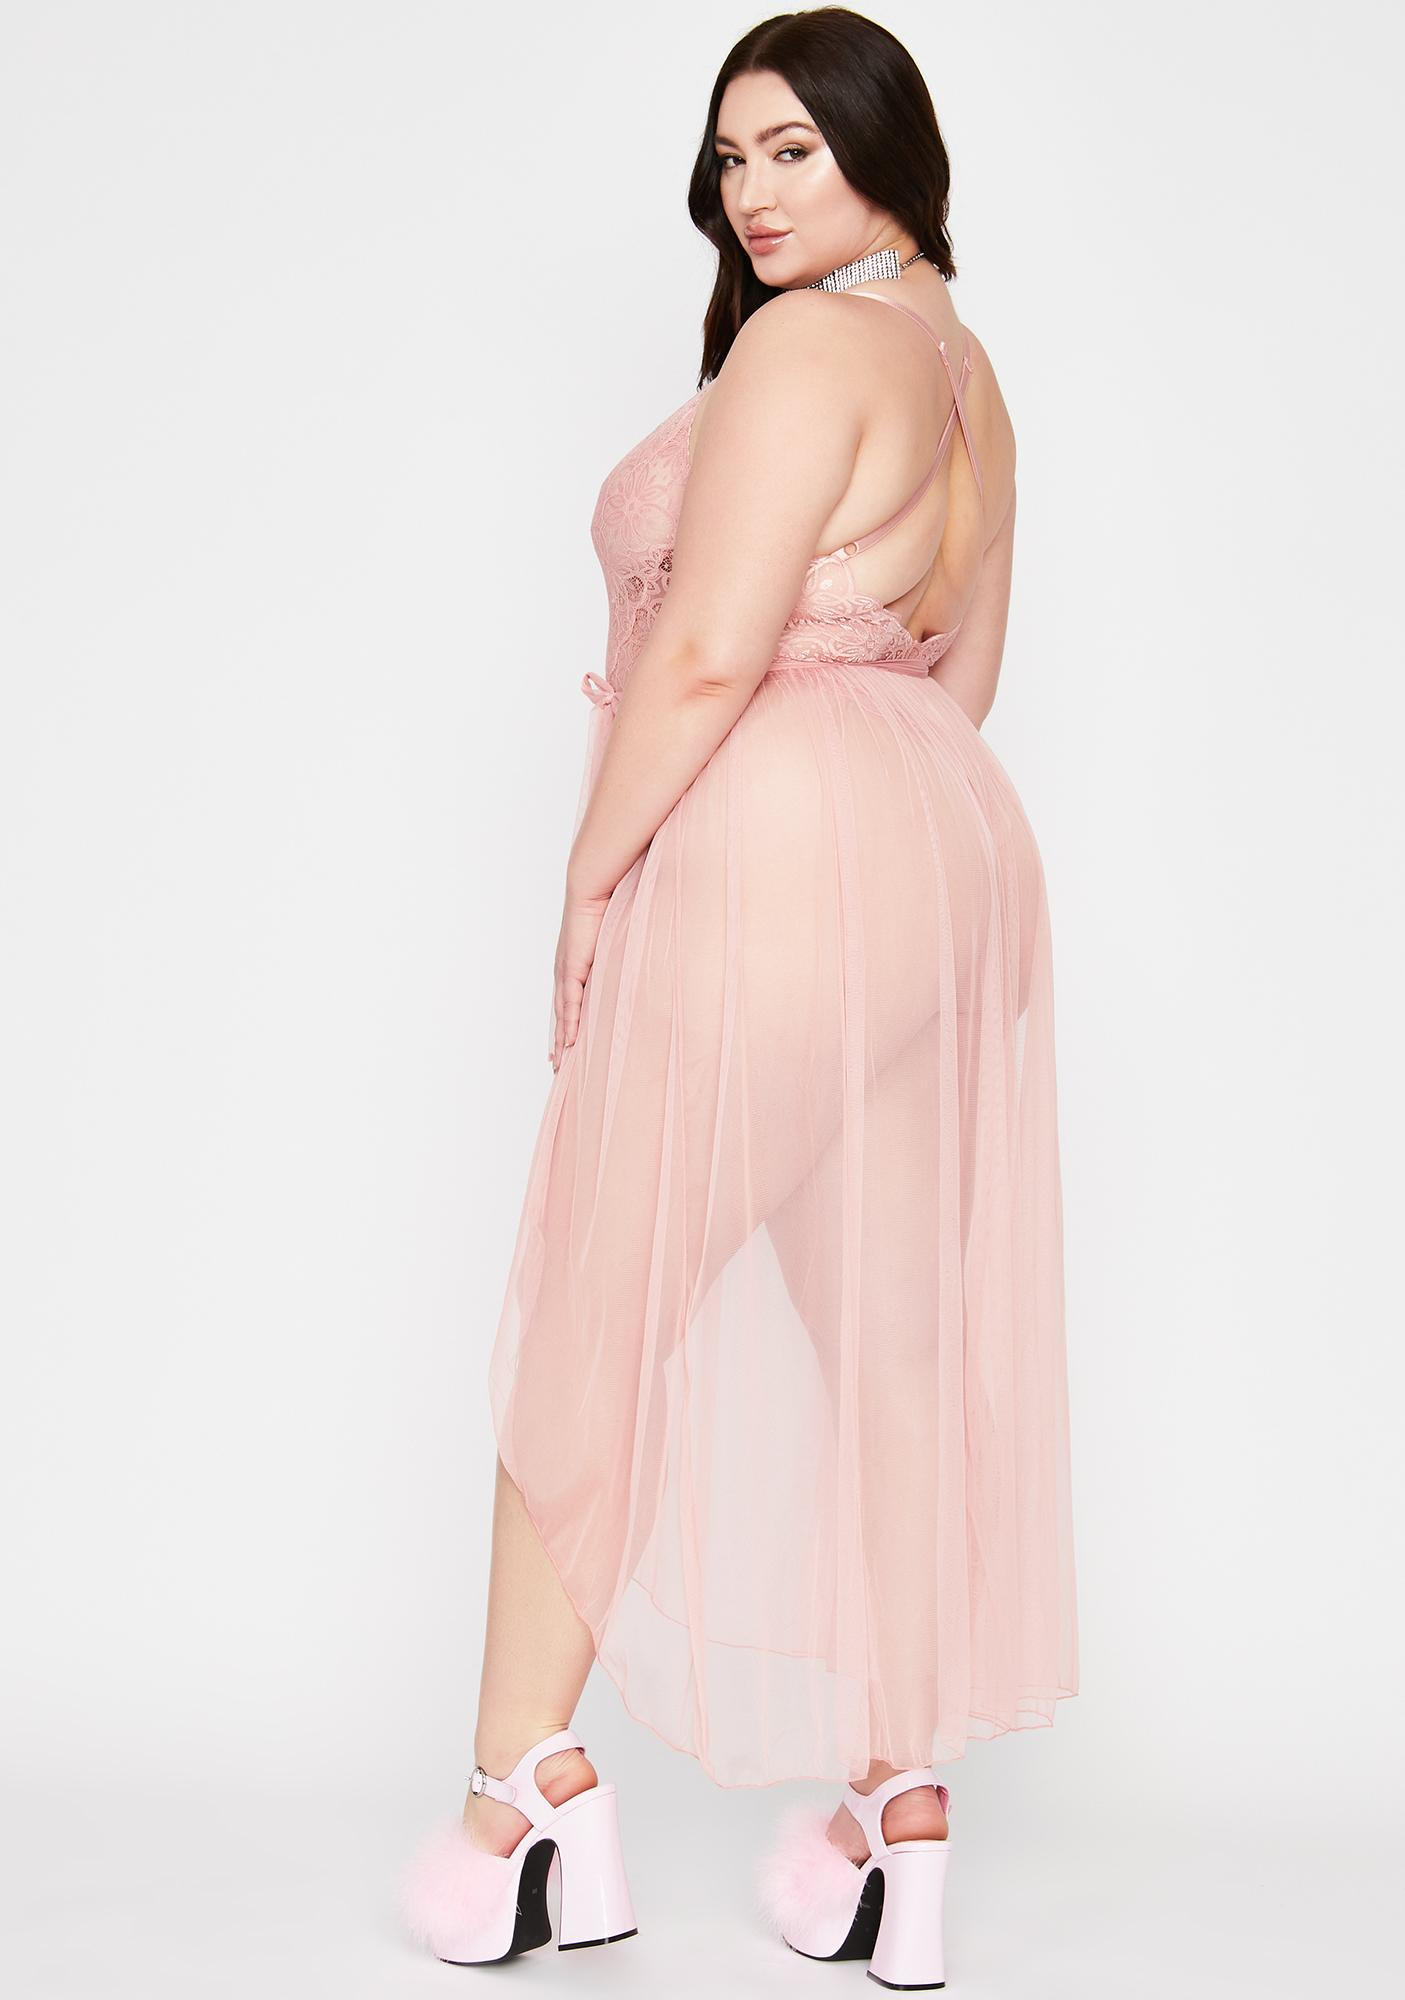 Divine Primadonna Pixie Tulle Skirt Set